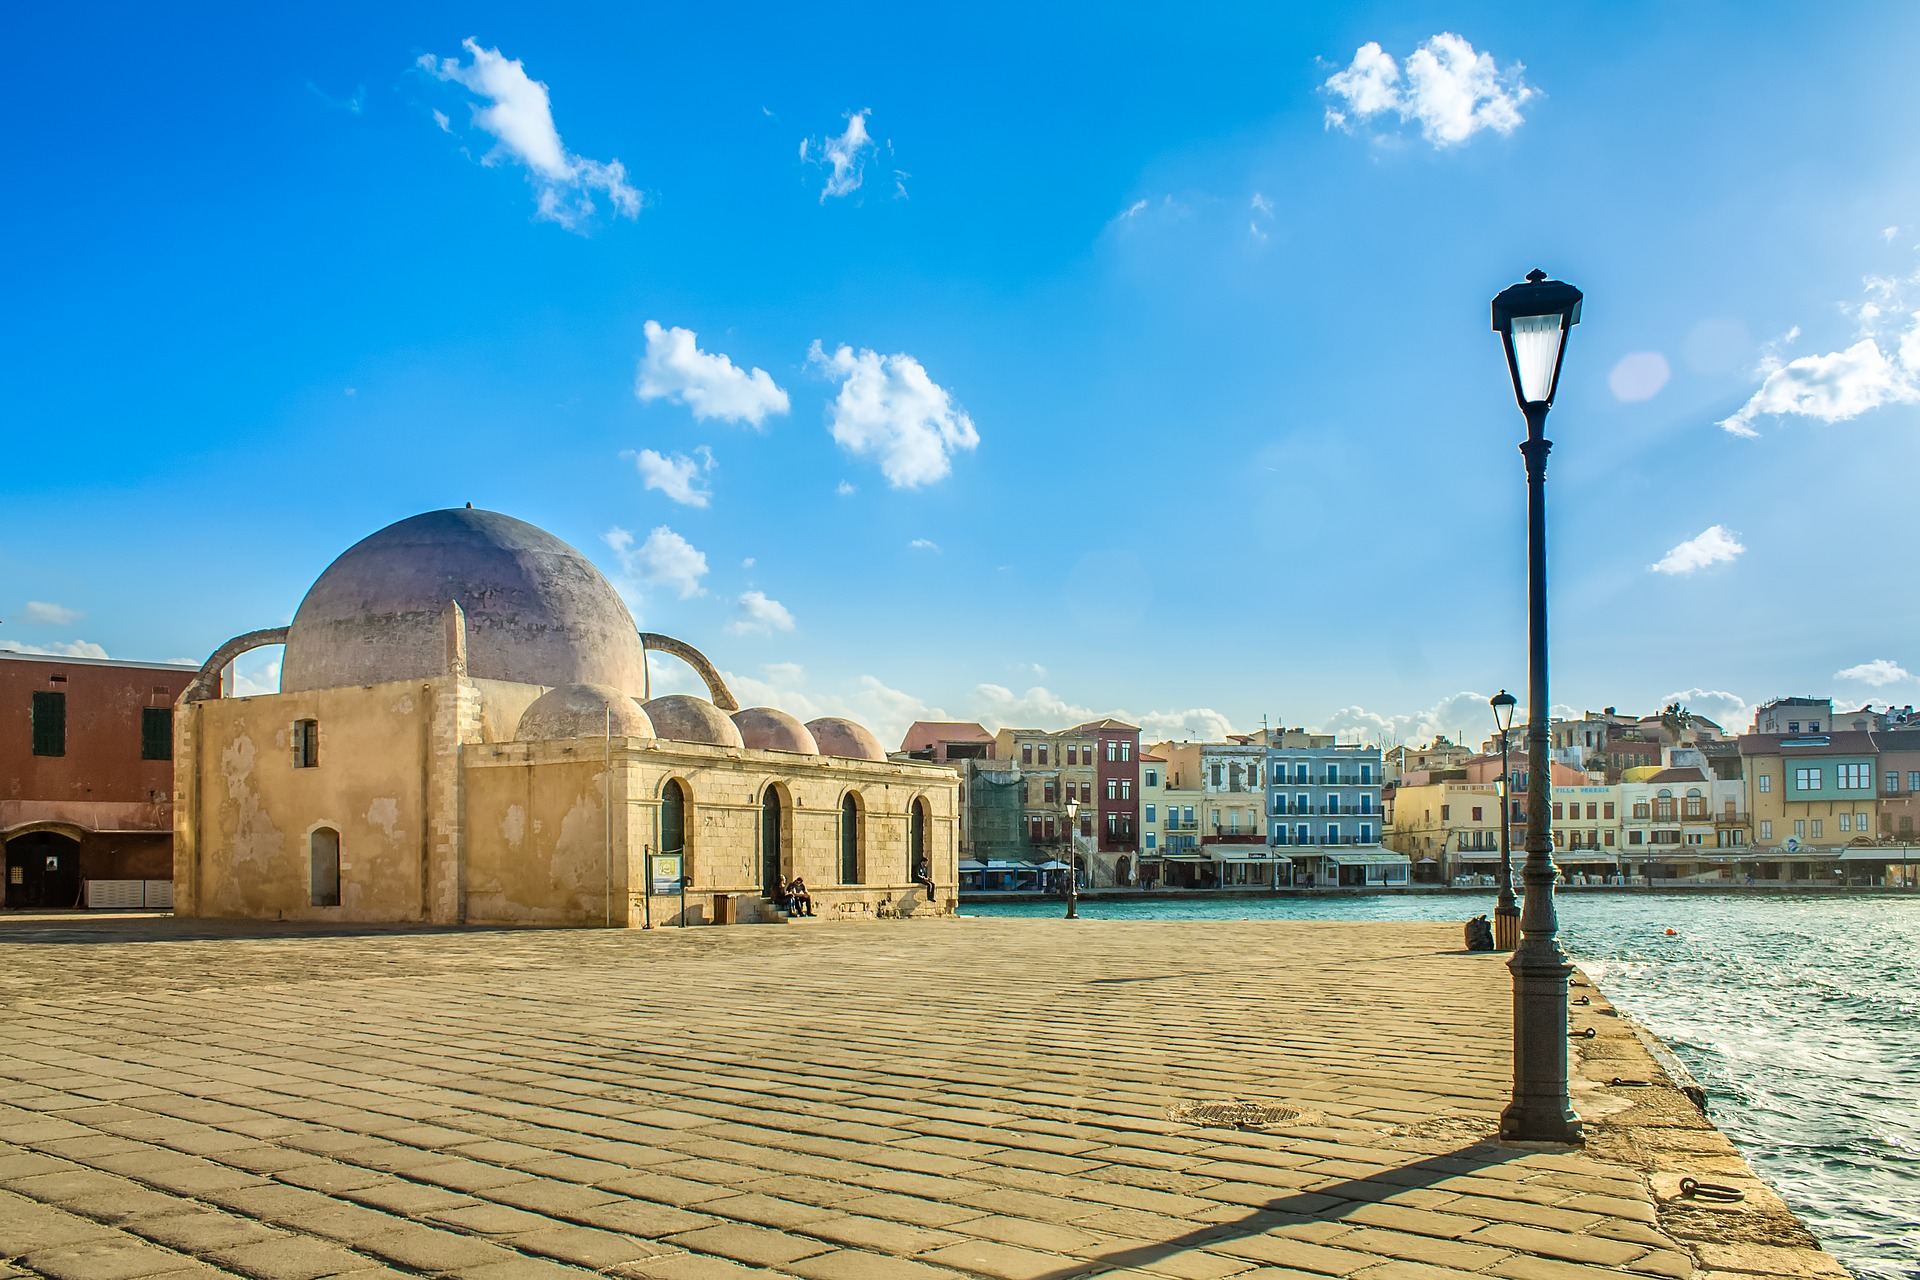 Chania die Altstadt der Insel